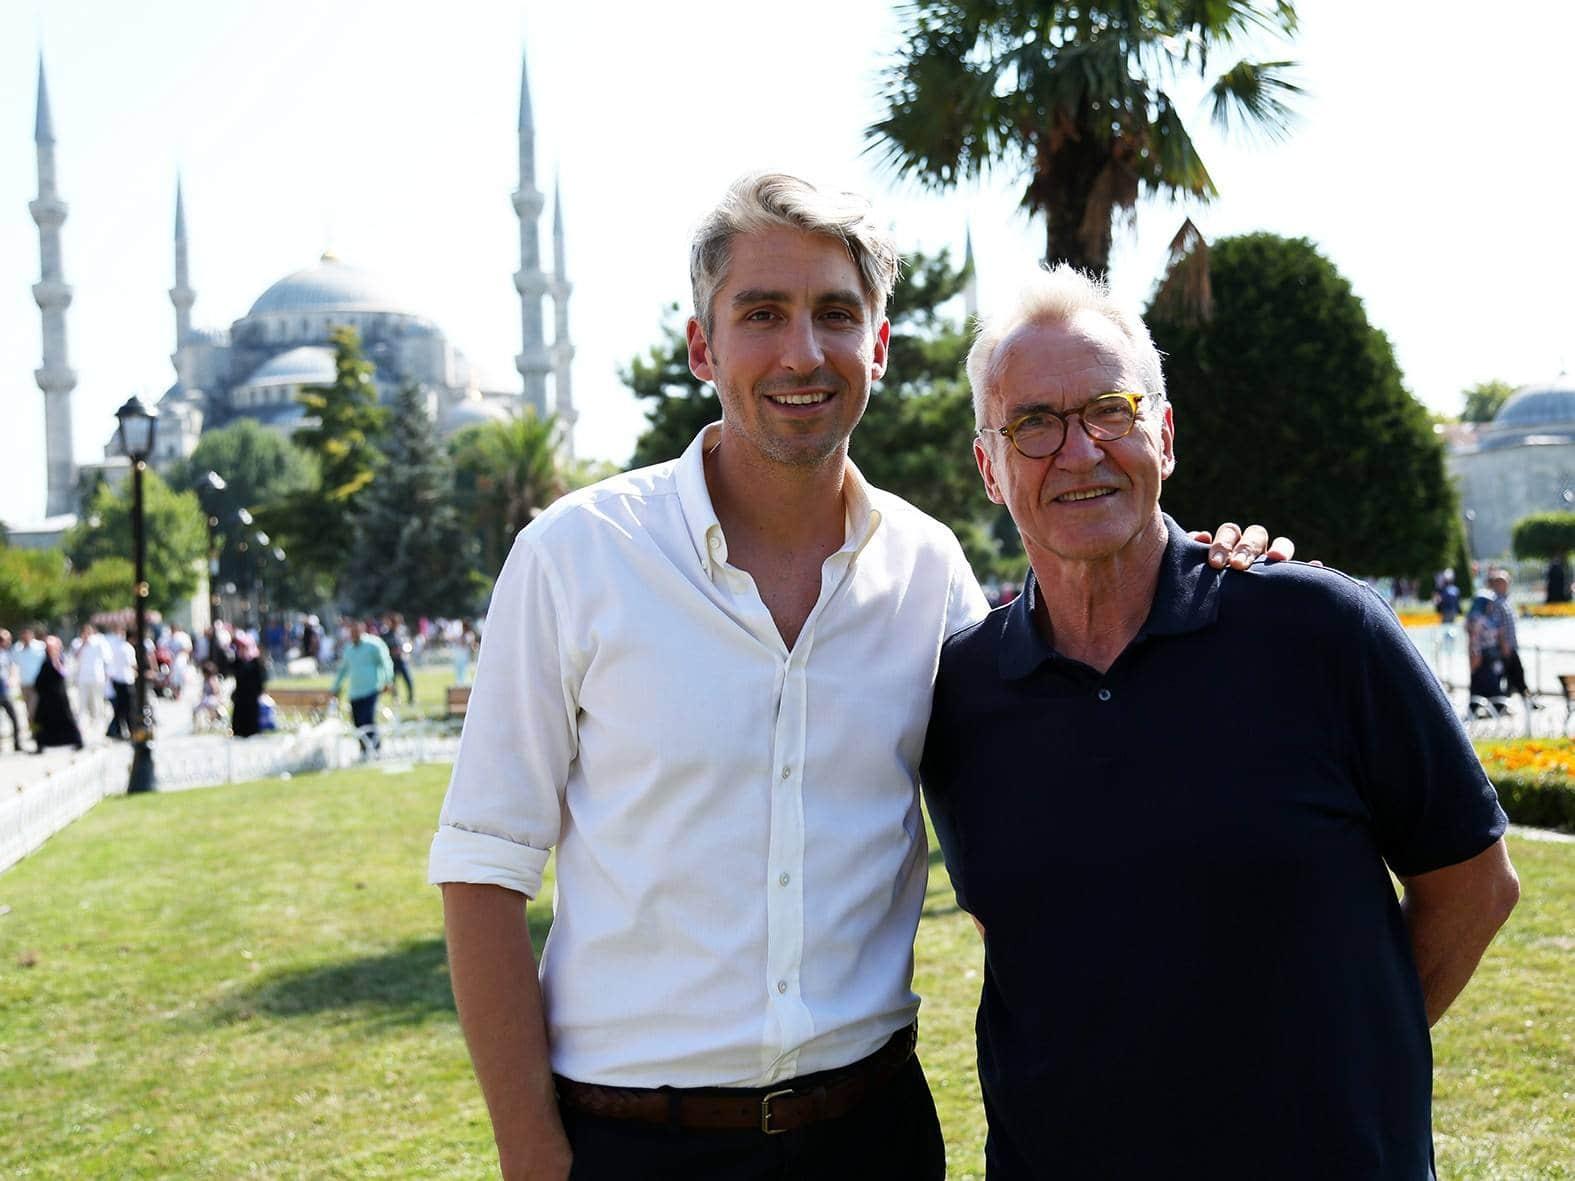 программа Travel Channel: Ларри и Джордж Лэм путешествуют по Турции Из Анкары в Бейпазари